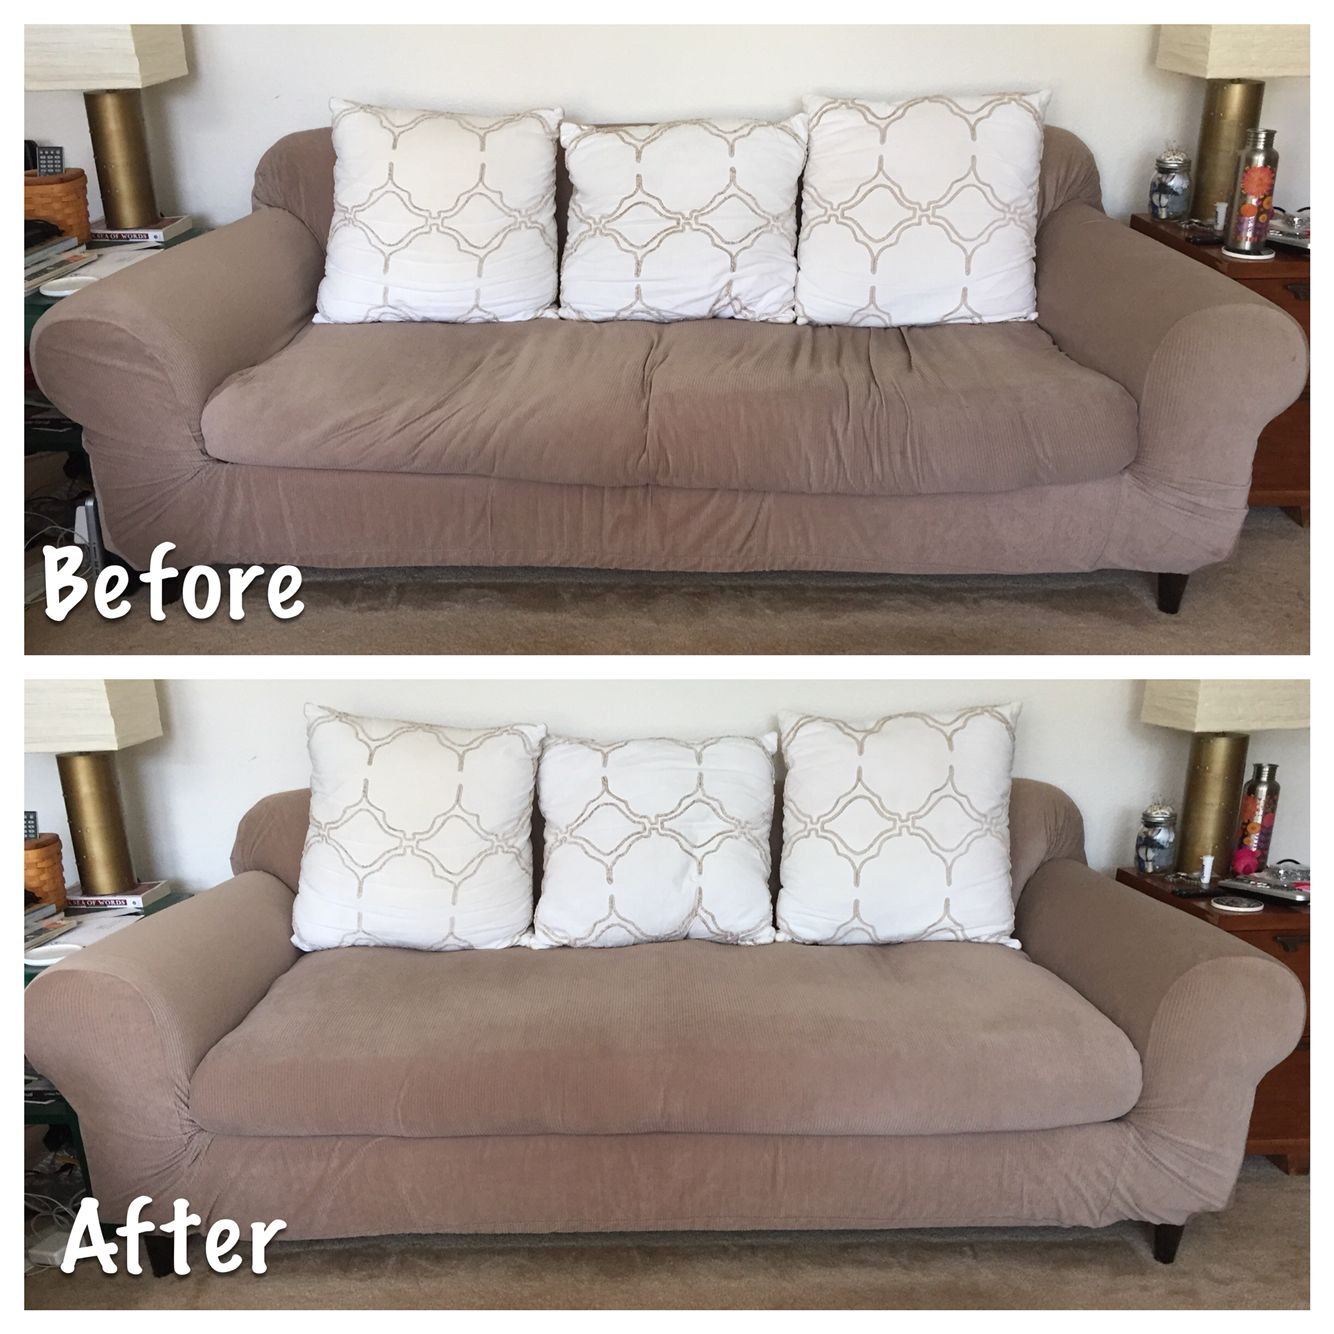 Restuffed Bottom Couch Cushion With Foam Mattress Topper Batting